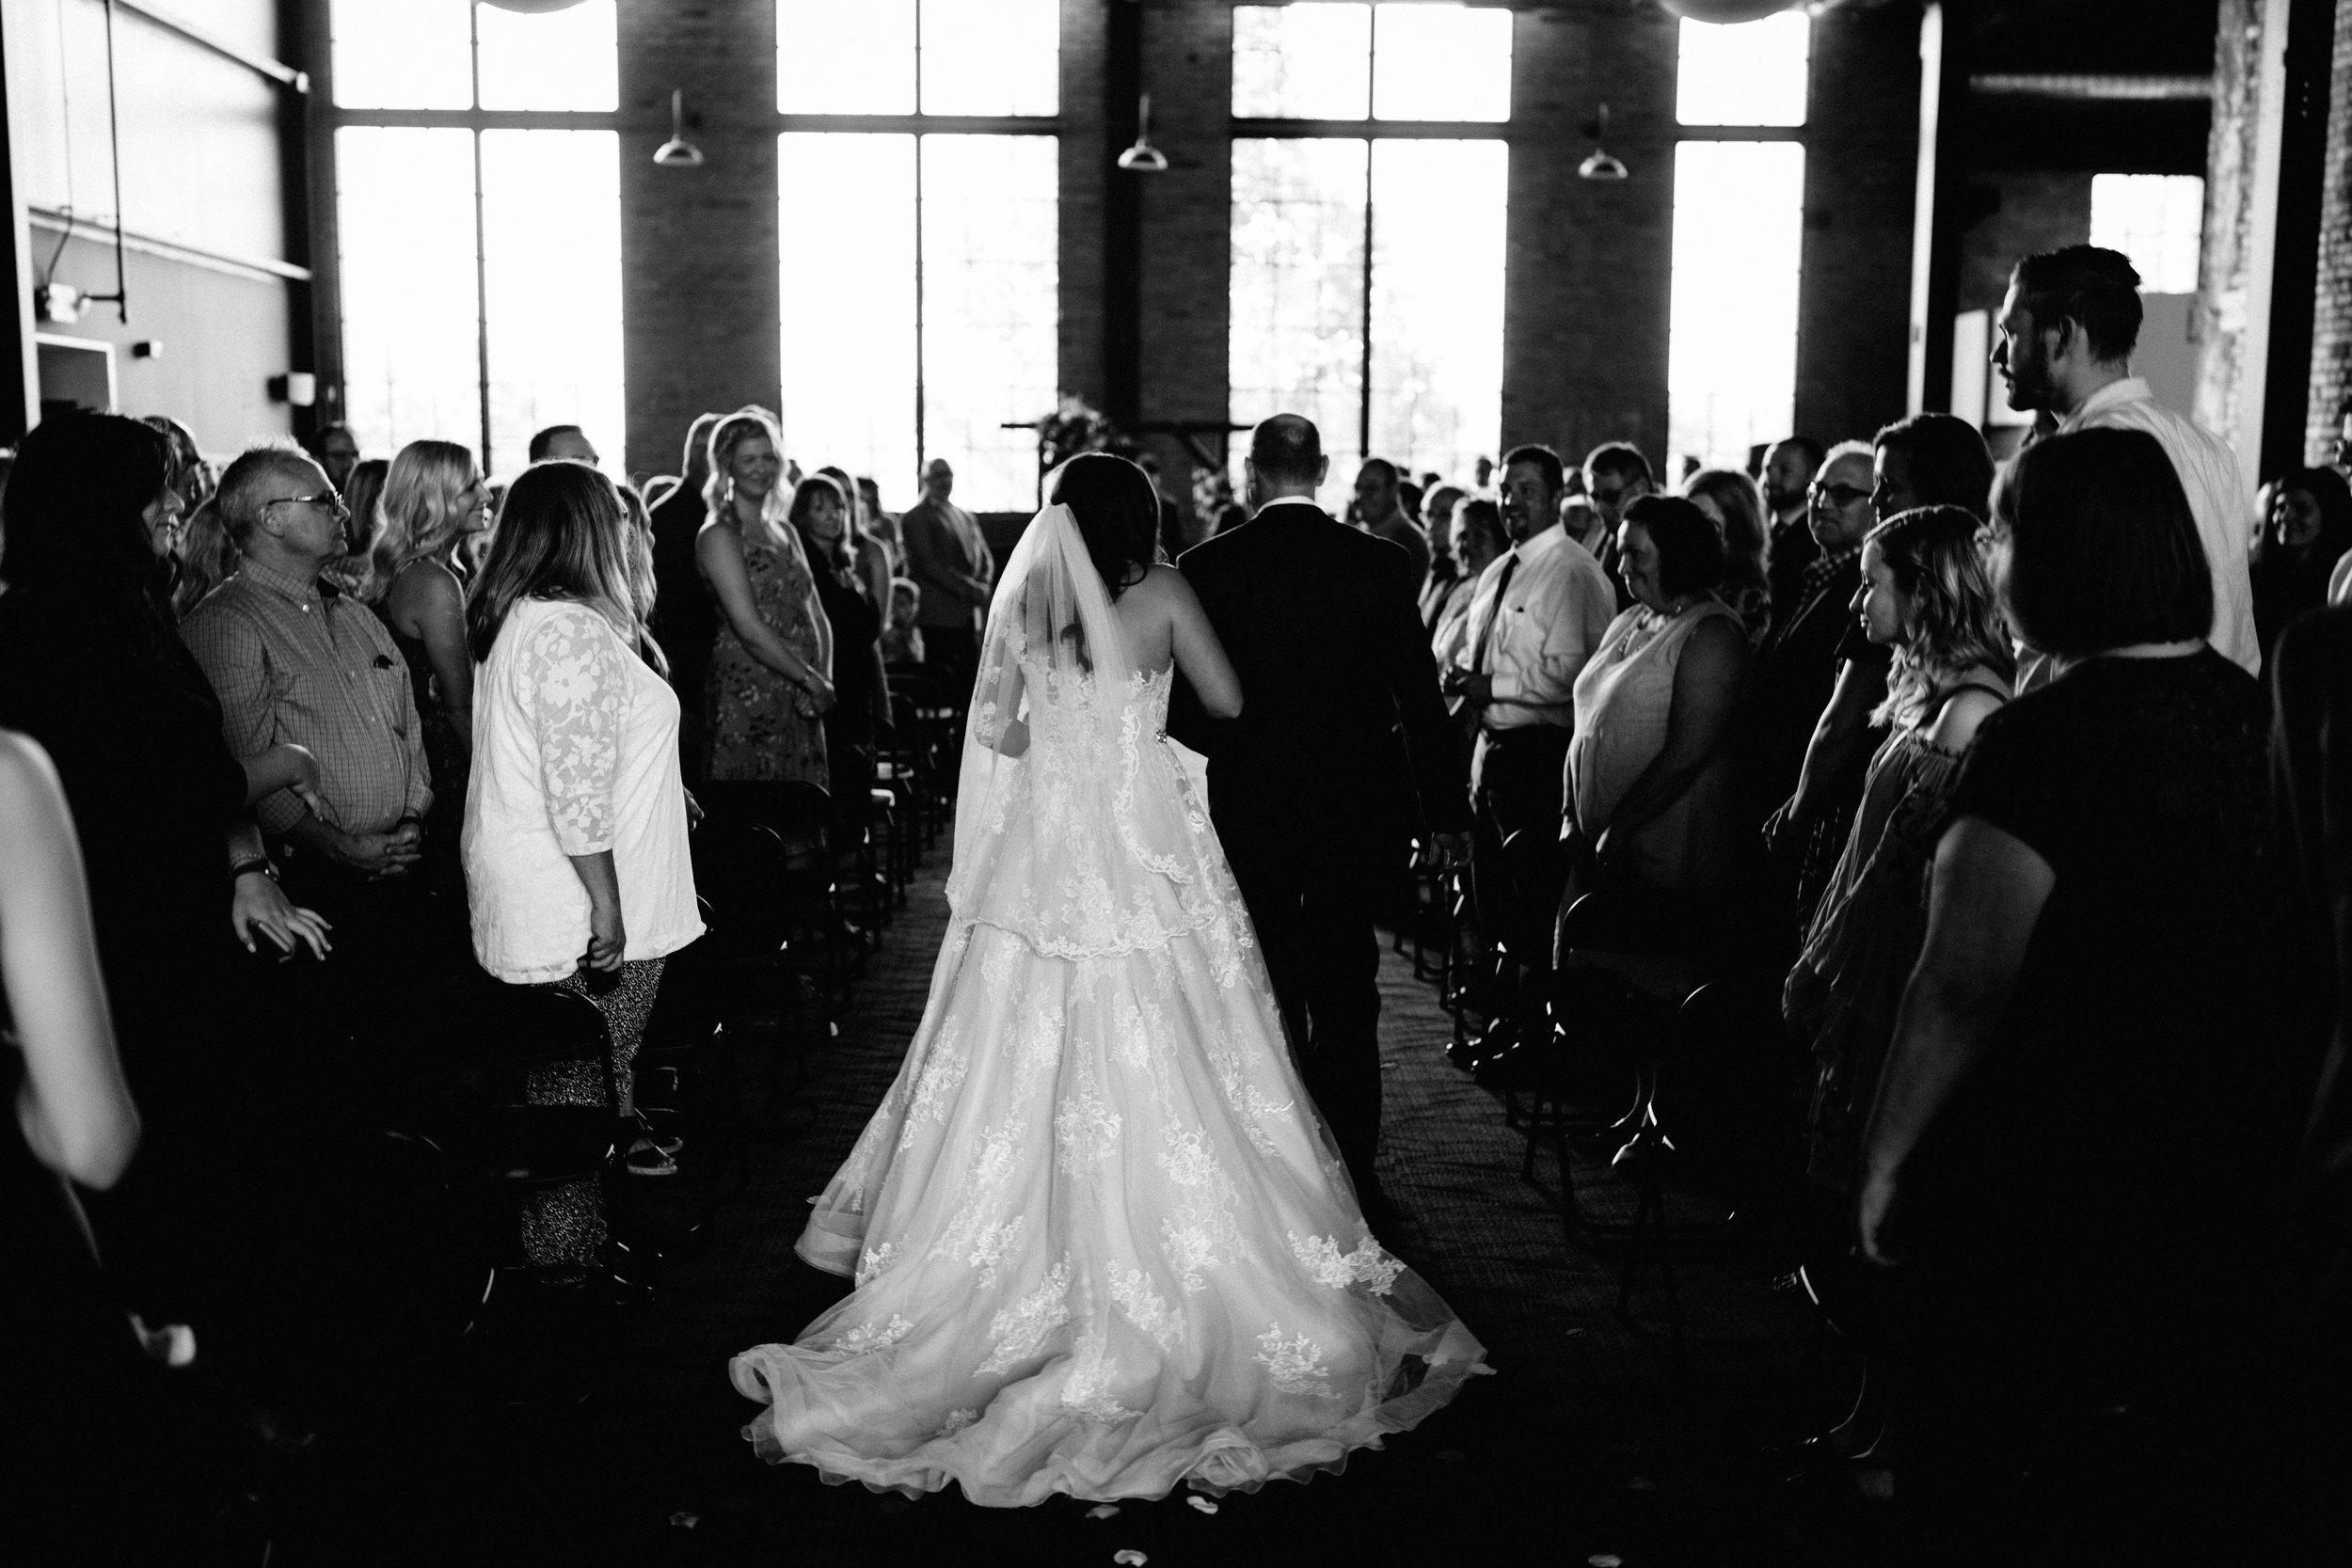 GRAYCENTOMHAMILTON-GRAND-RAPIDS-WEDDING-PHOTOGRAPHY-47.jpg